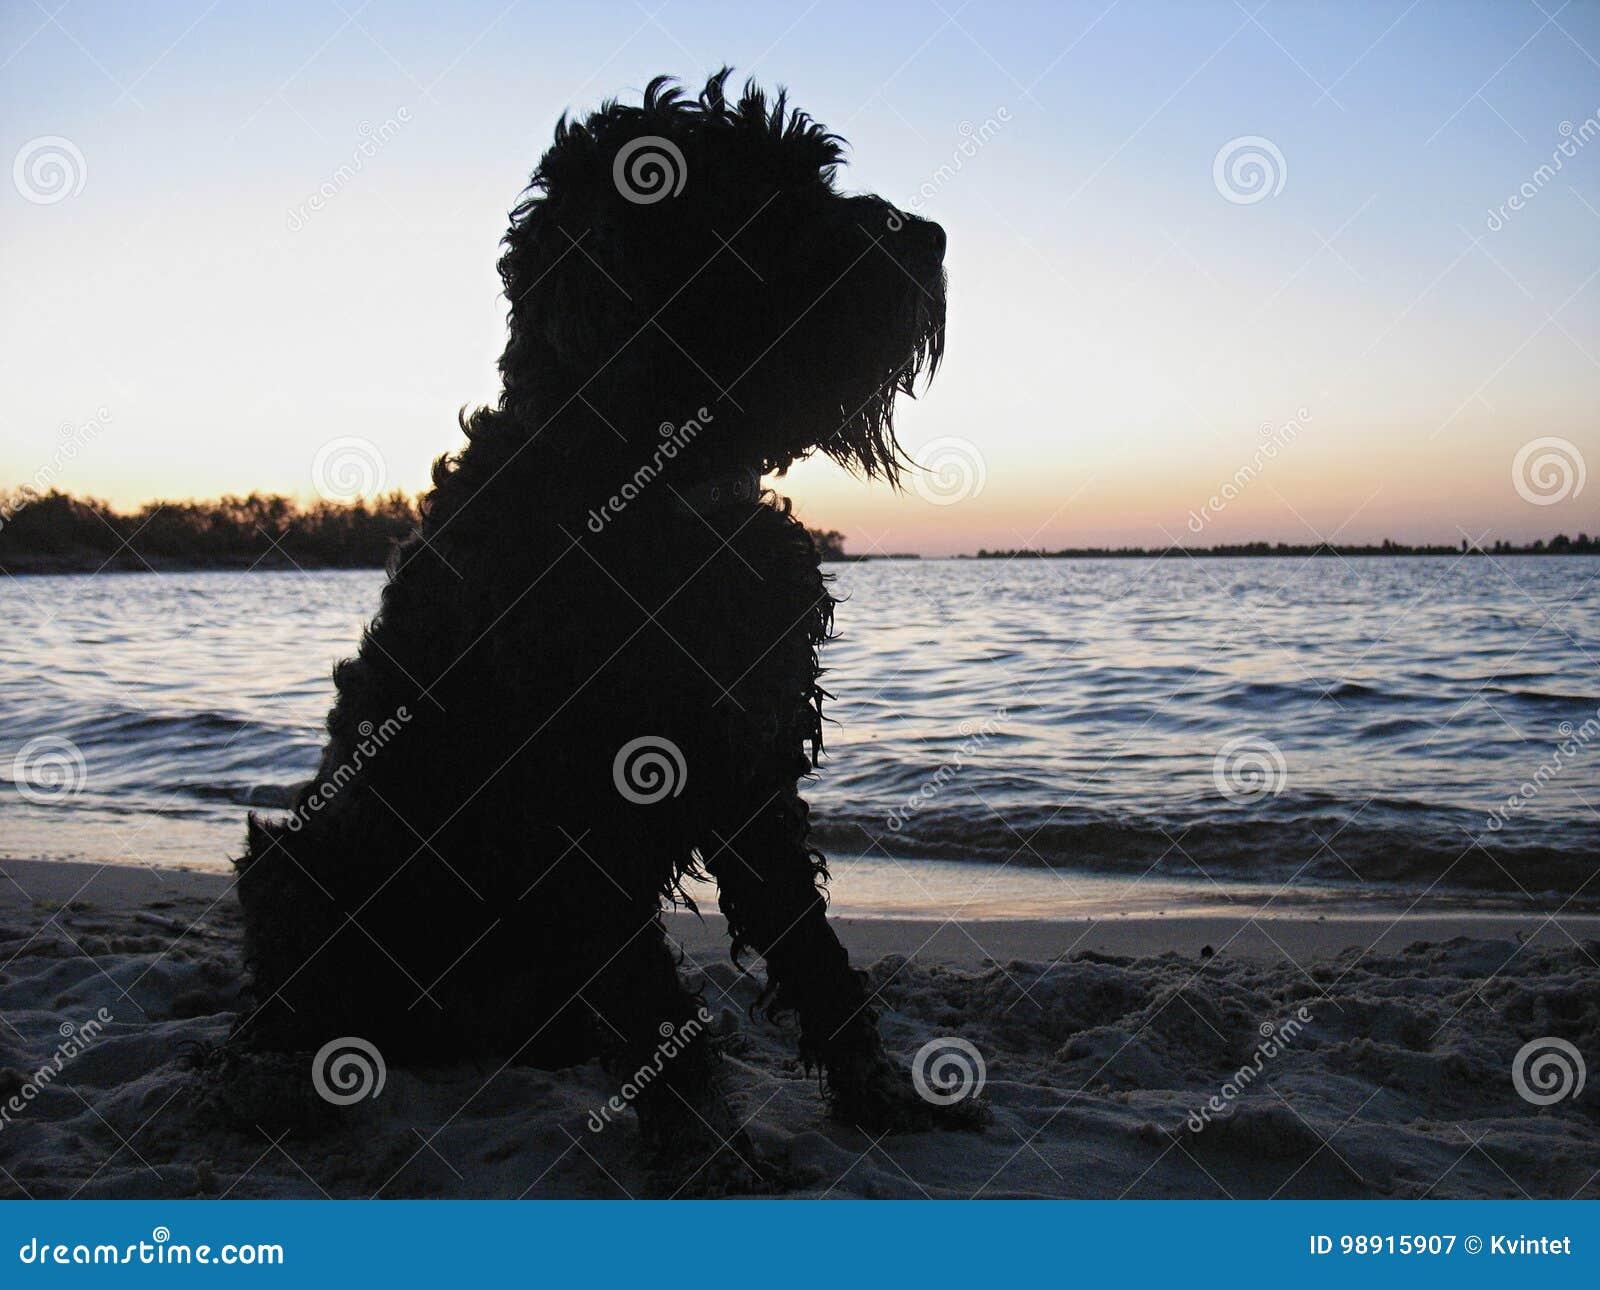 Kontur av en hund på stranden på solnedgången